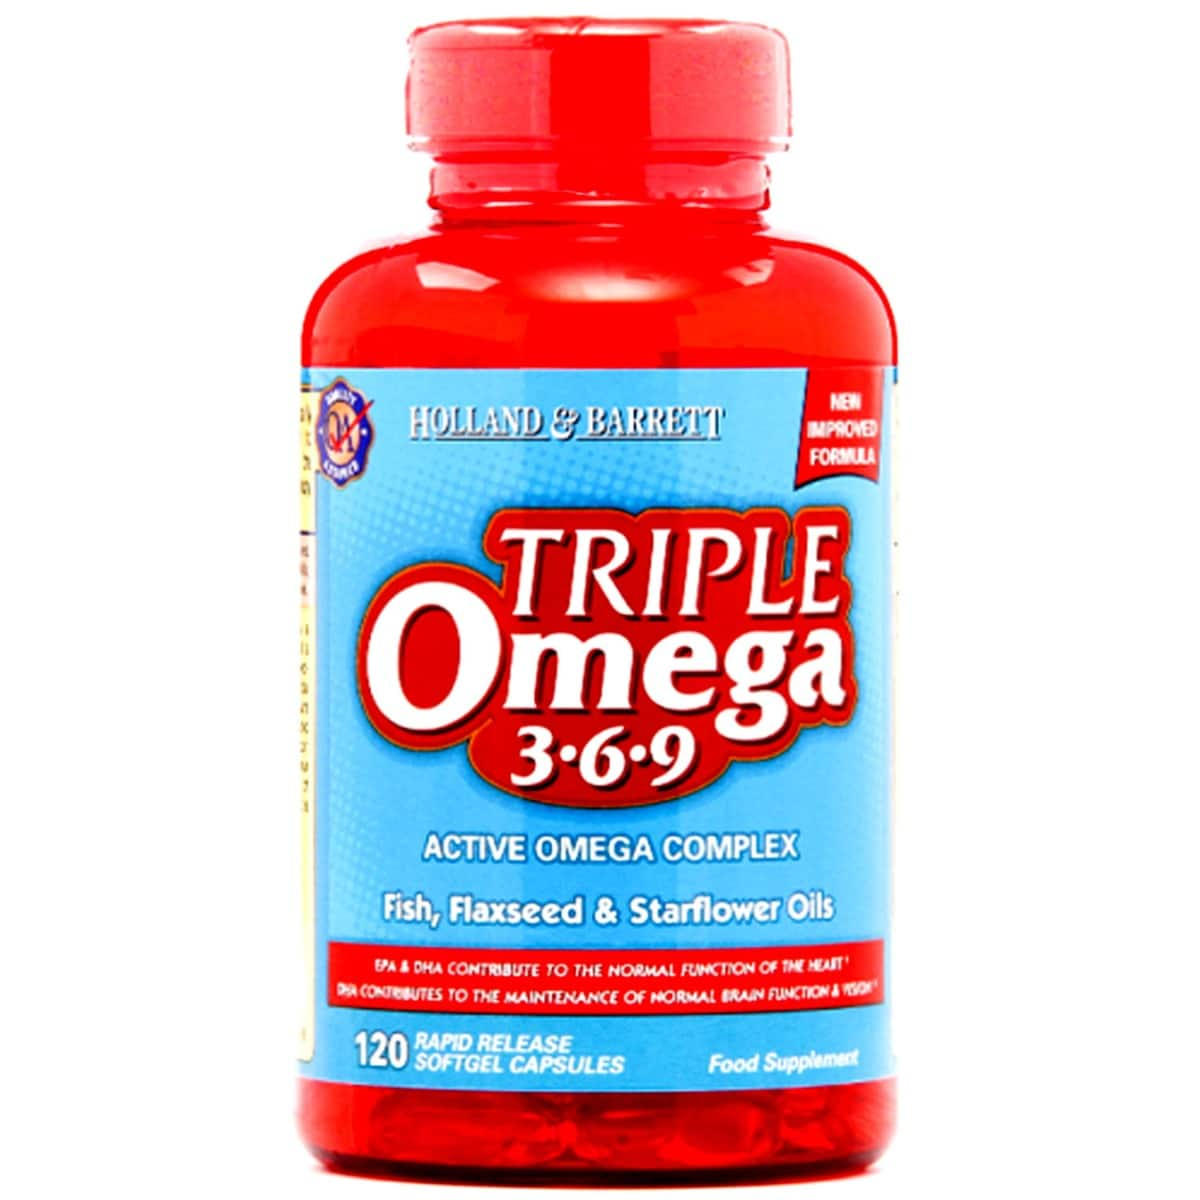 Holland & Barrett Triple Omega 3-6-9, 120 Capsules, Pack of 1